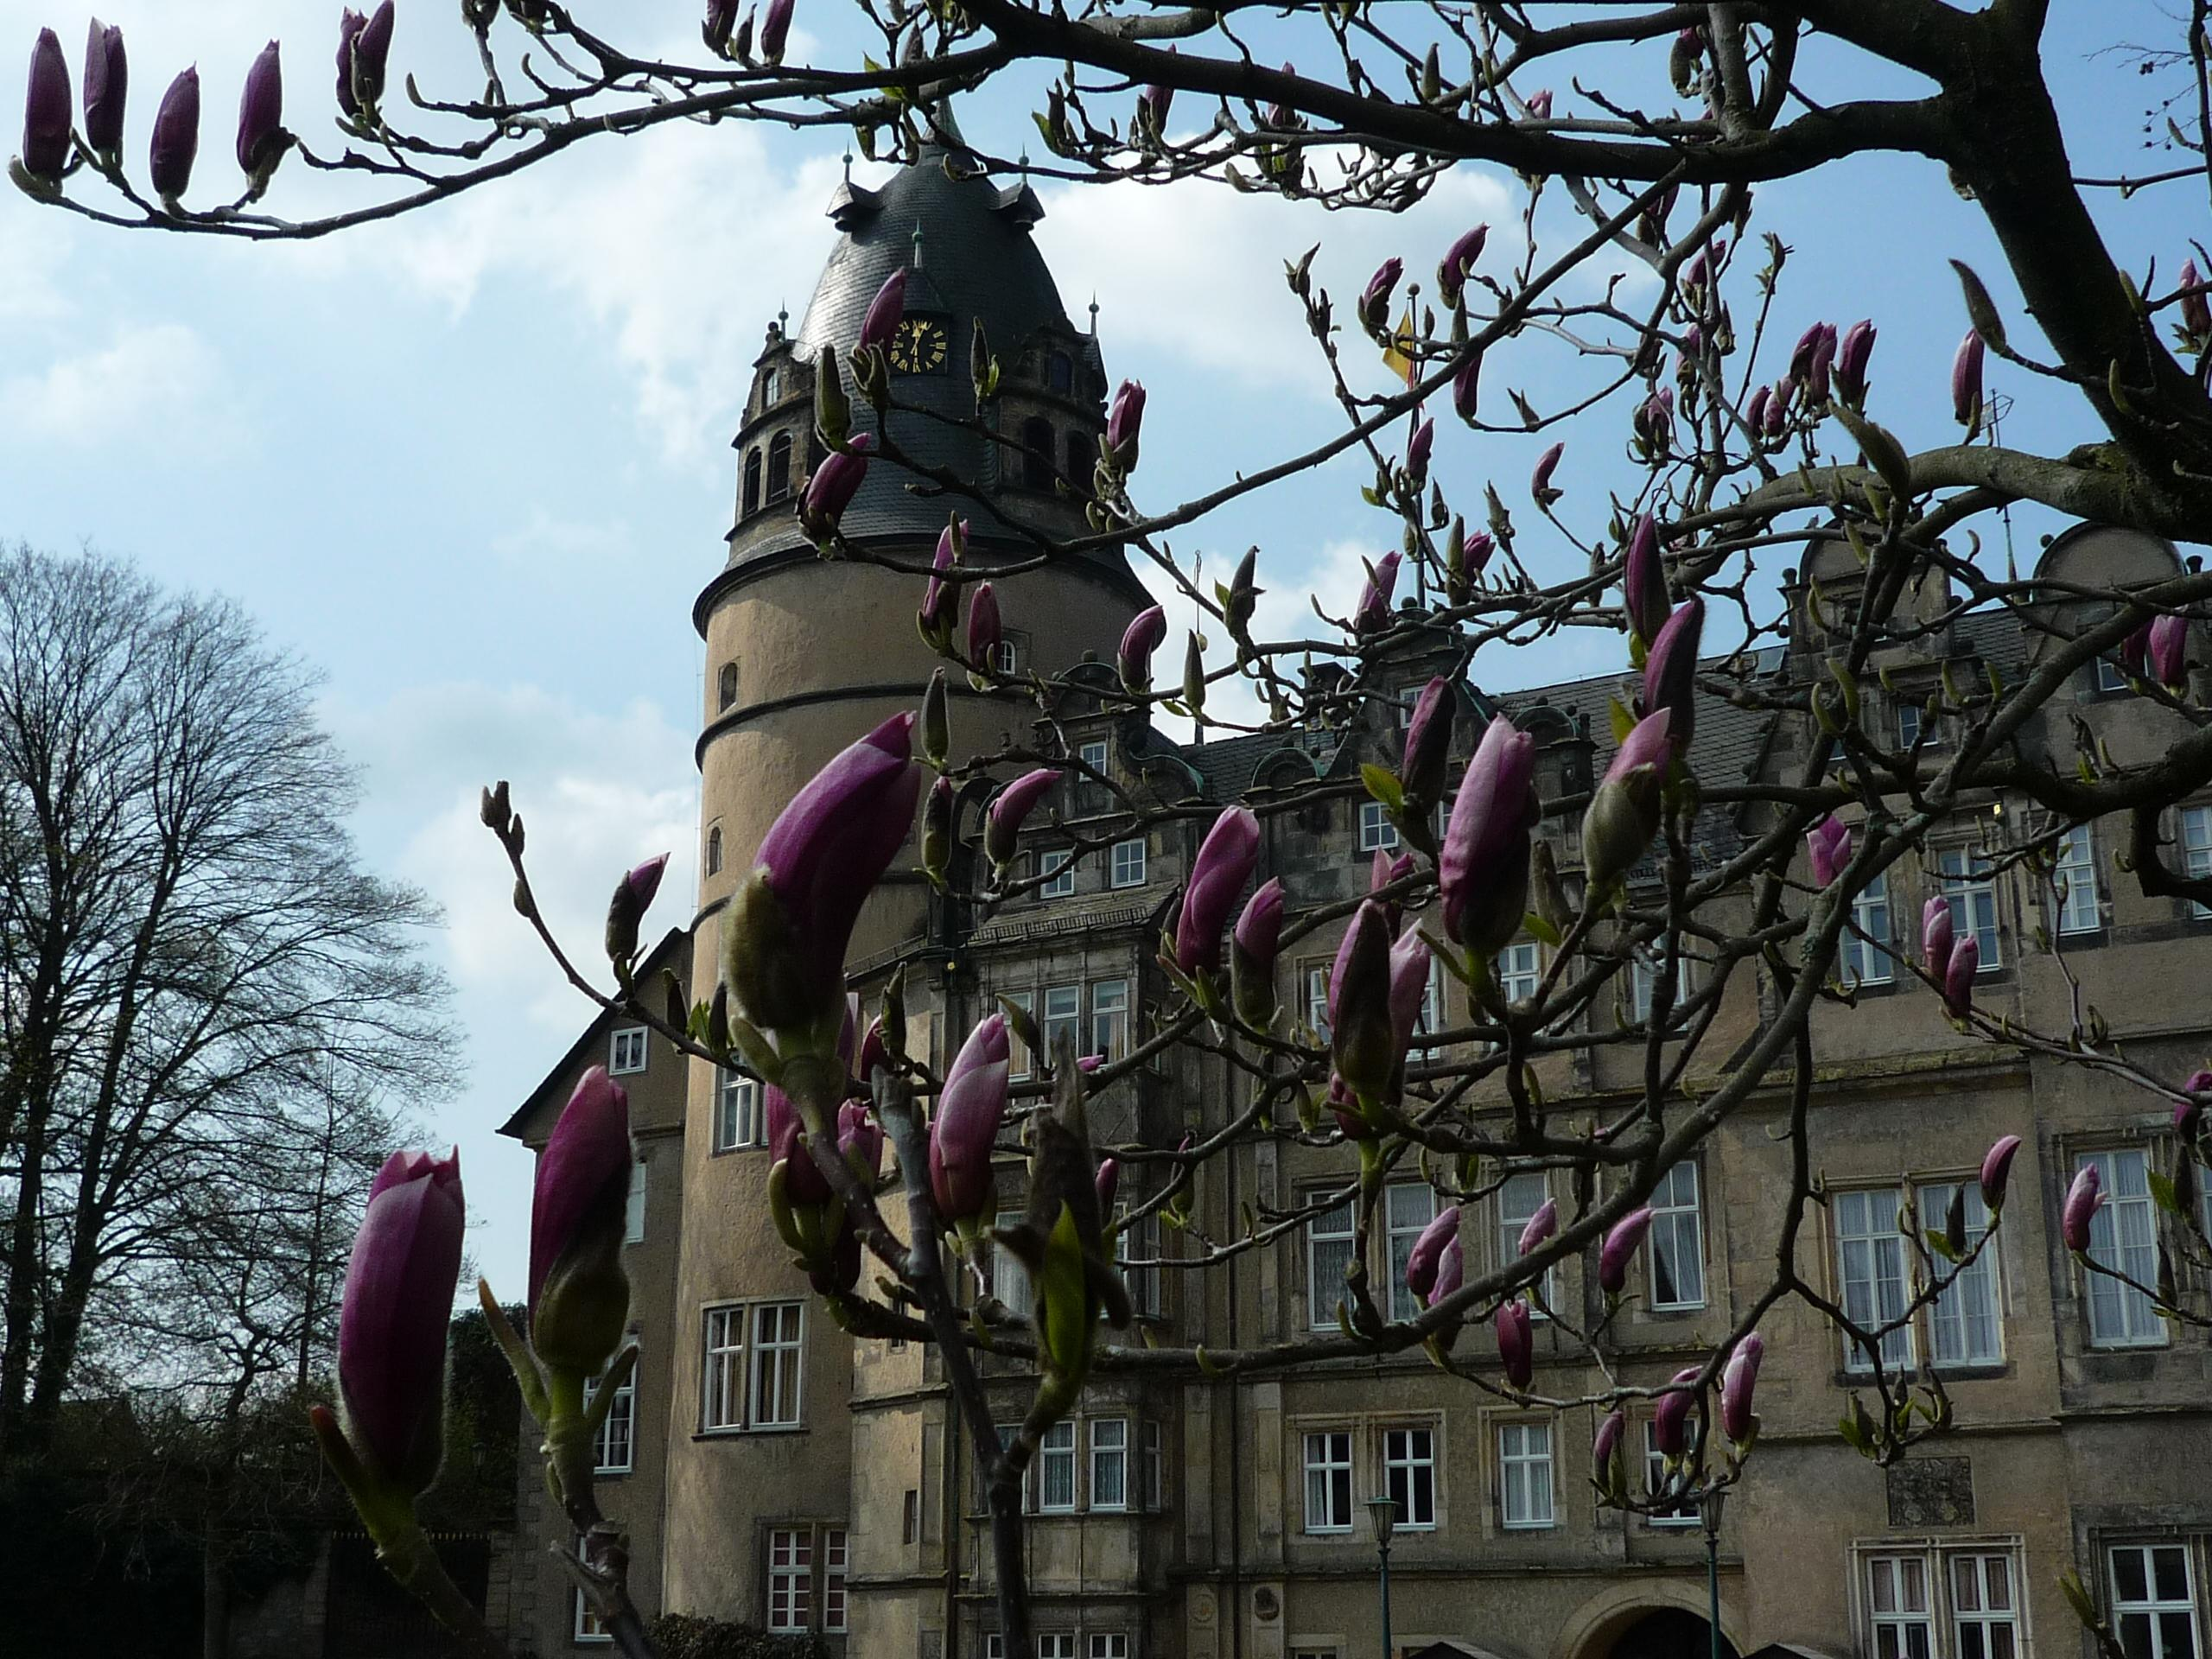 Fürstliches Residenzschloss Detmold, Frühling im Schloßpark